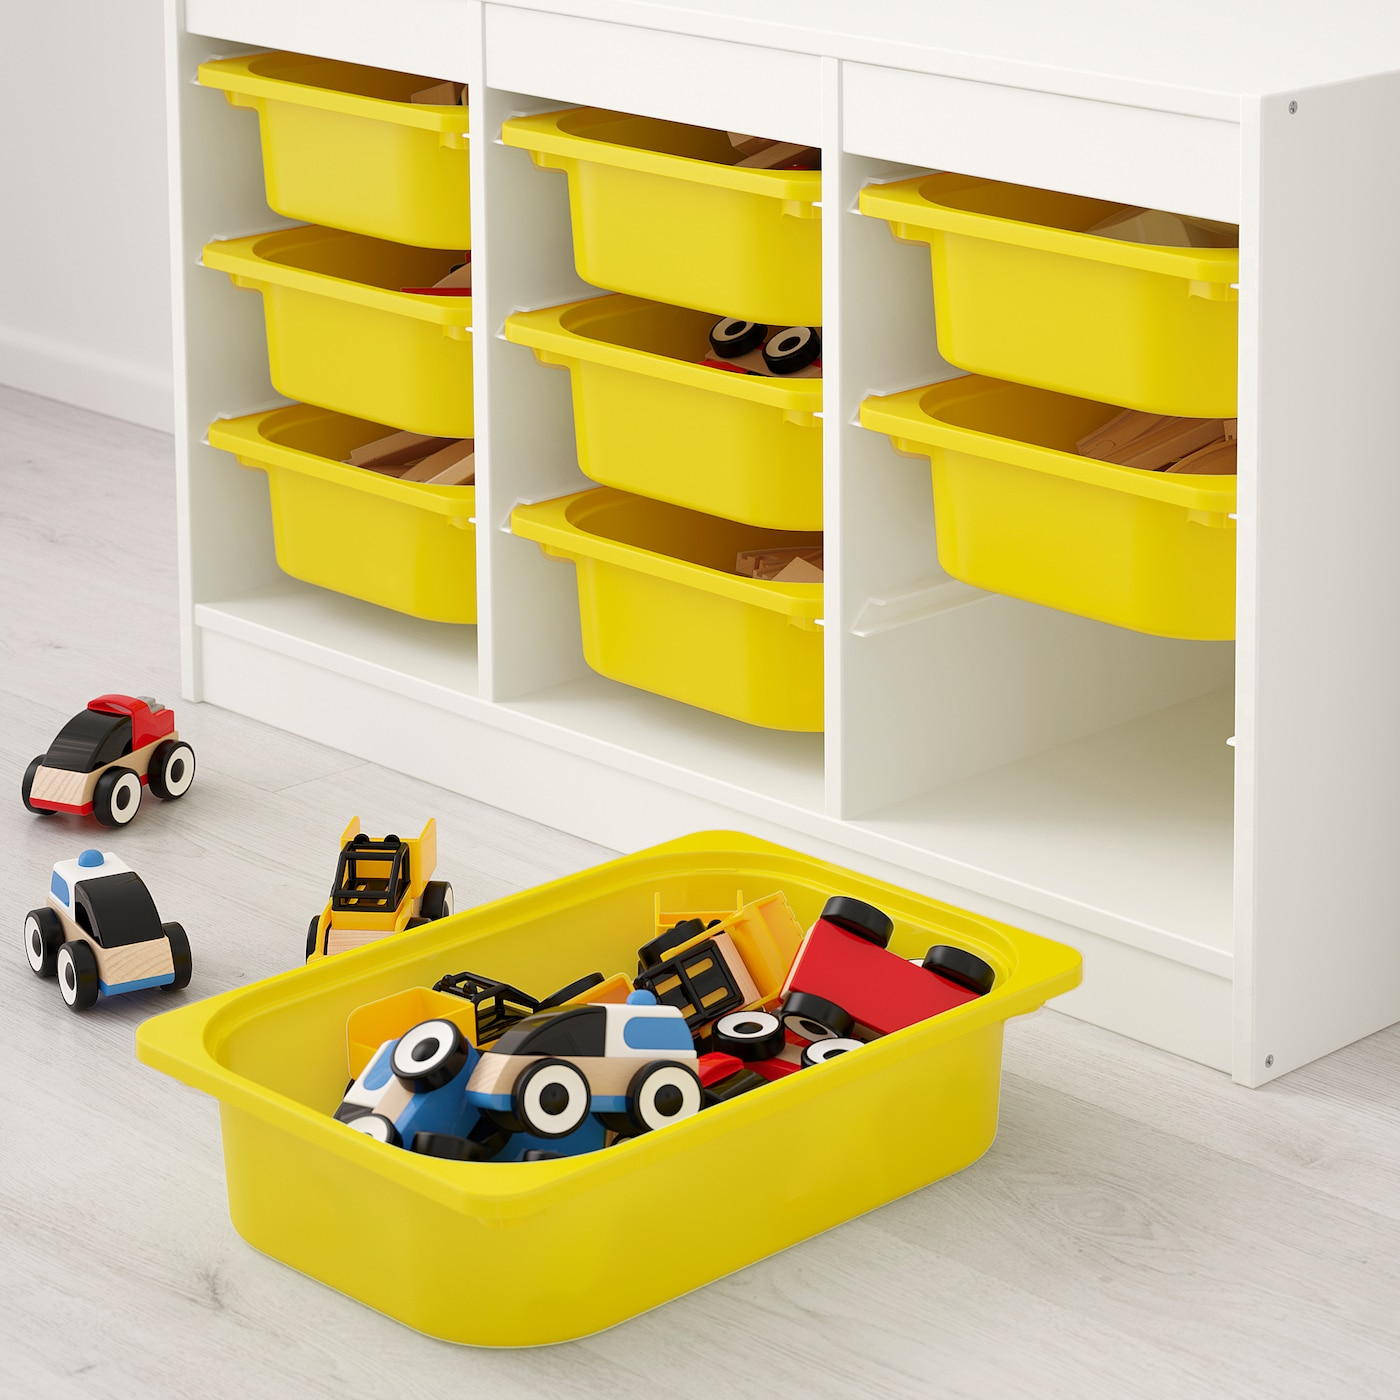 Set of 4 Ikea TROFAST Storage box Yellow